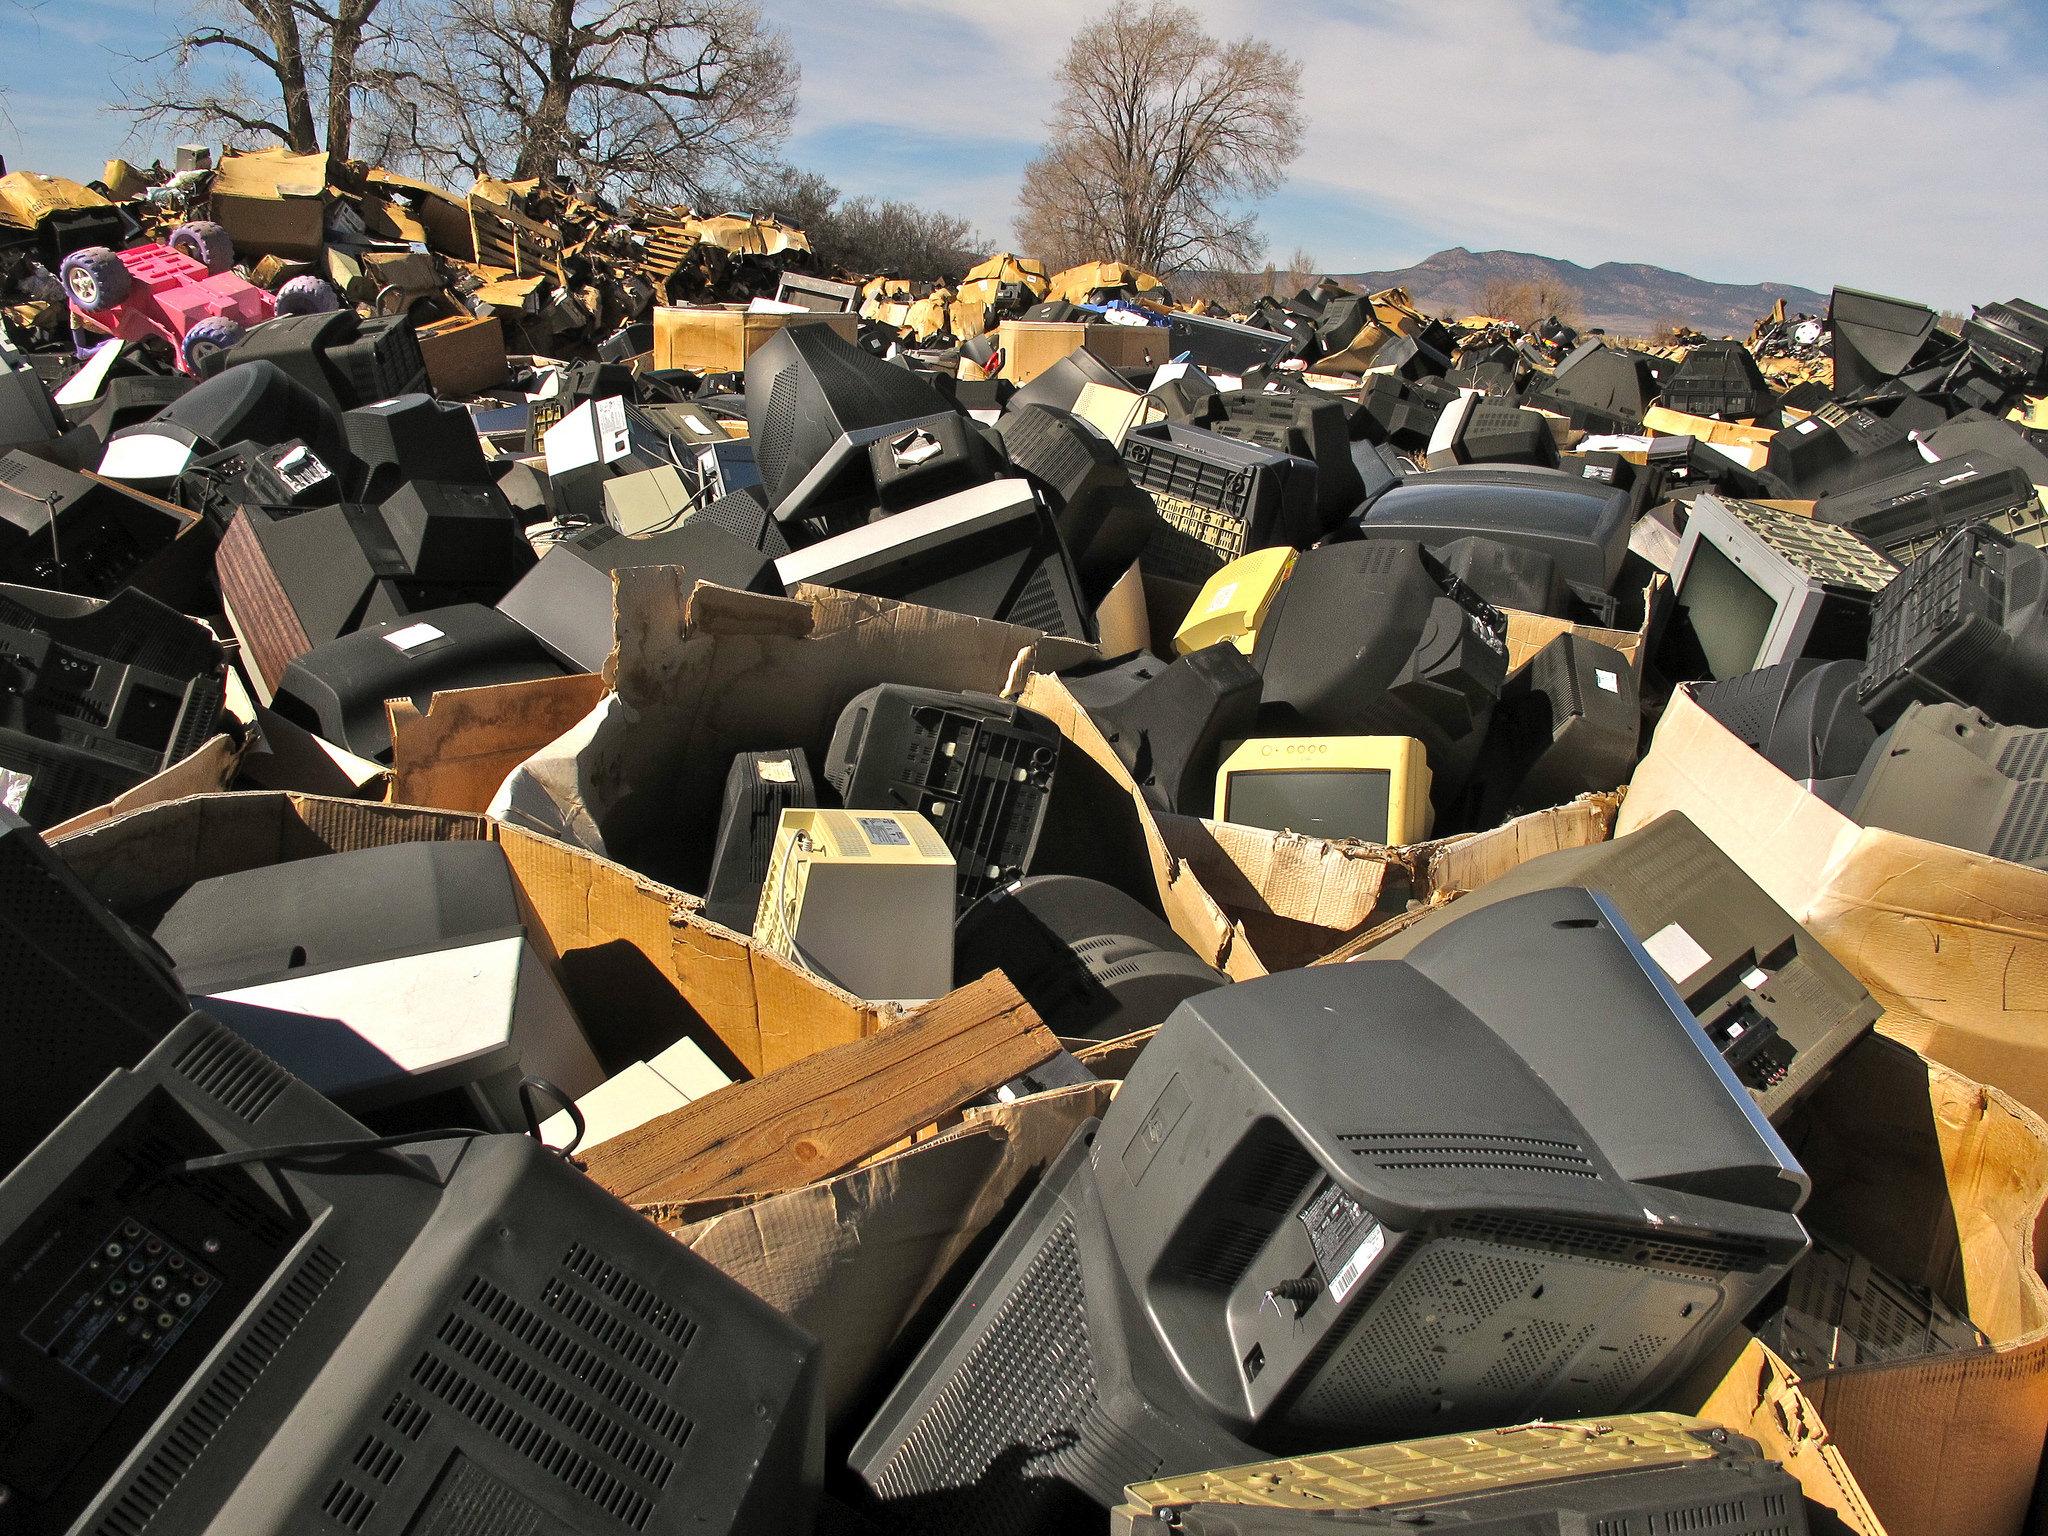 BAN investigators found dumped TV monitors in Utah in 2014